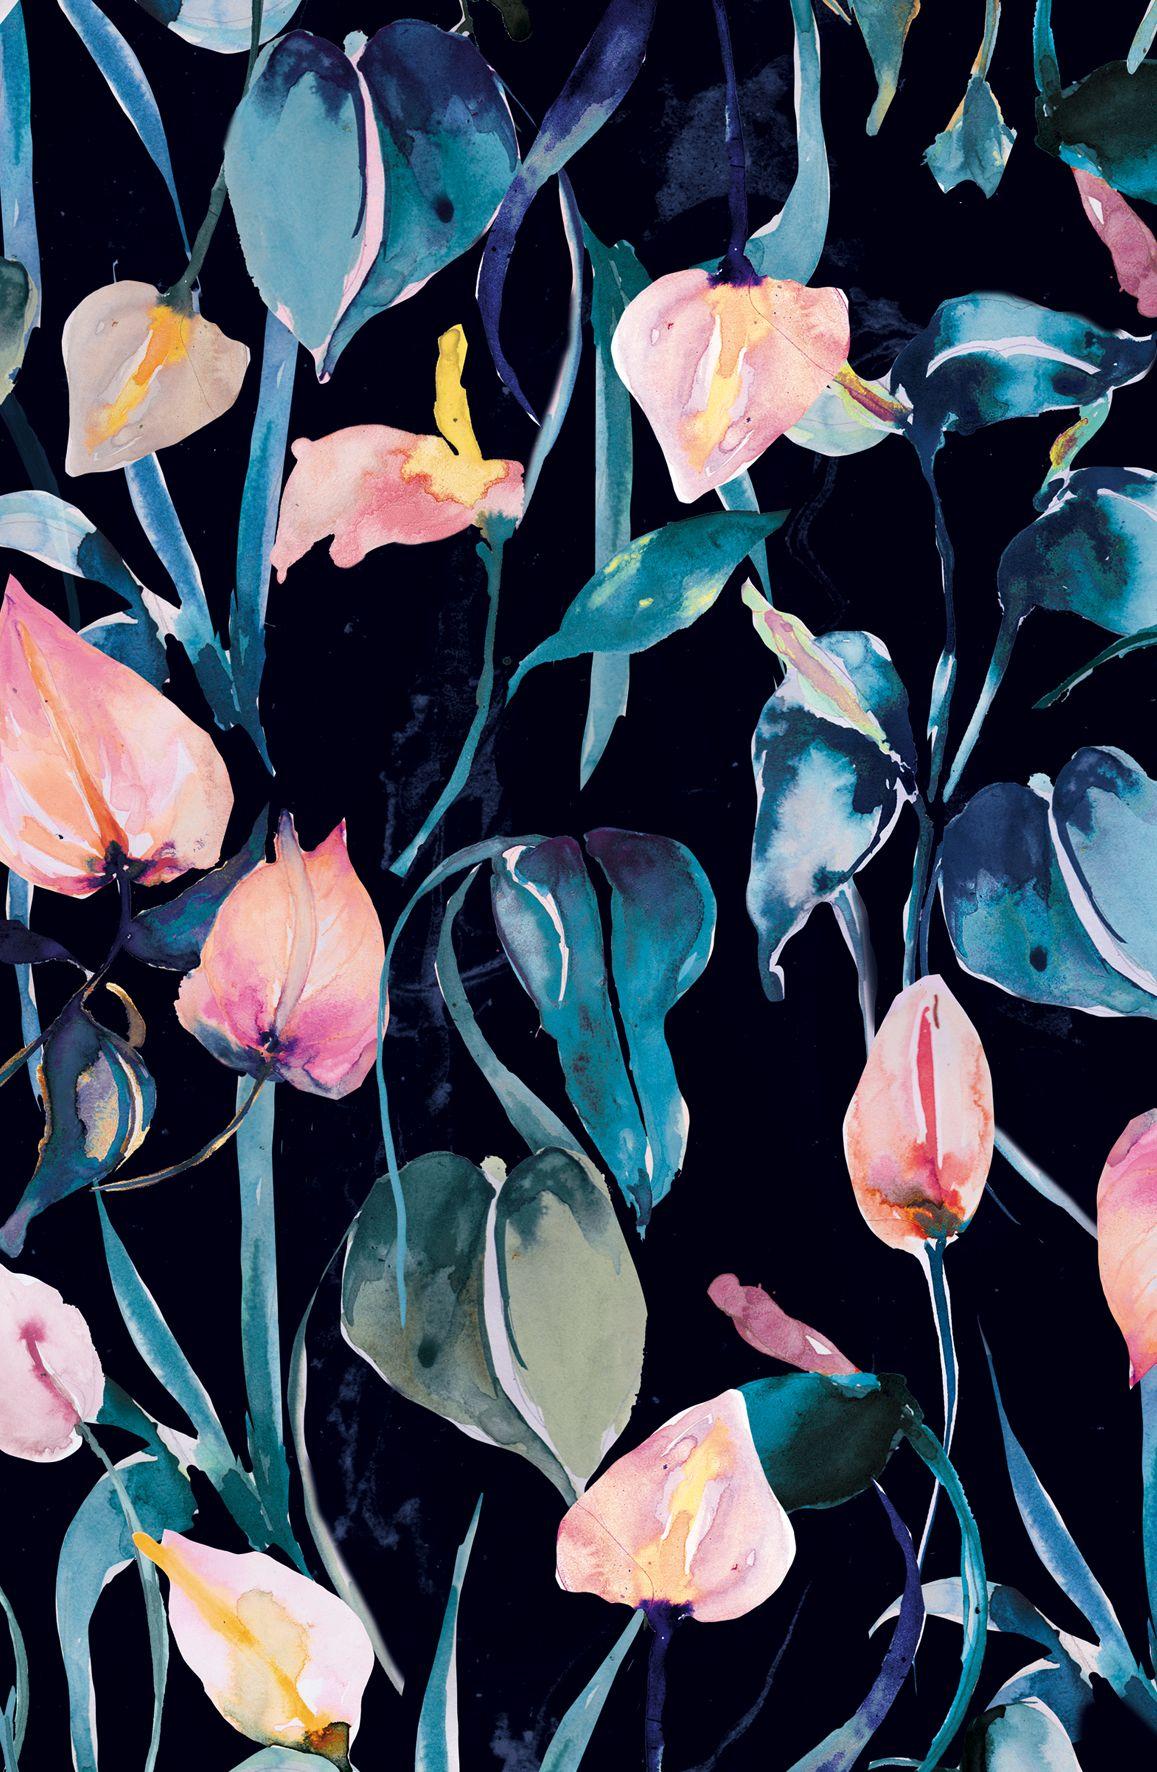 Nikki Strange Night Lilies Darkflorals Tumblr Pattern Prints